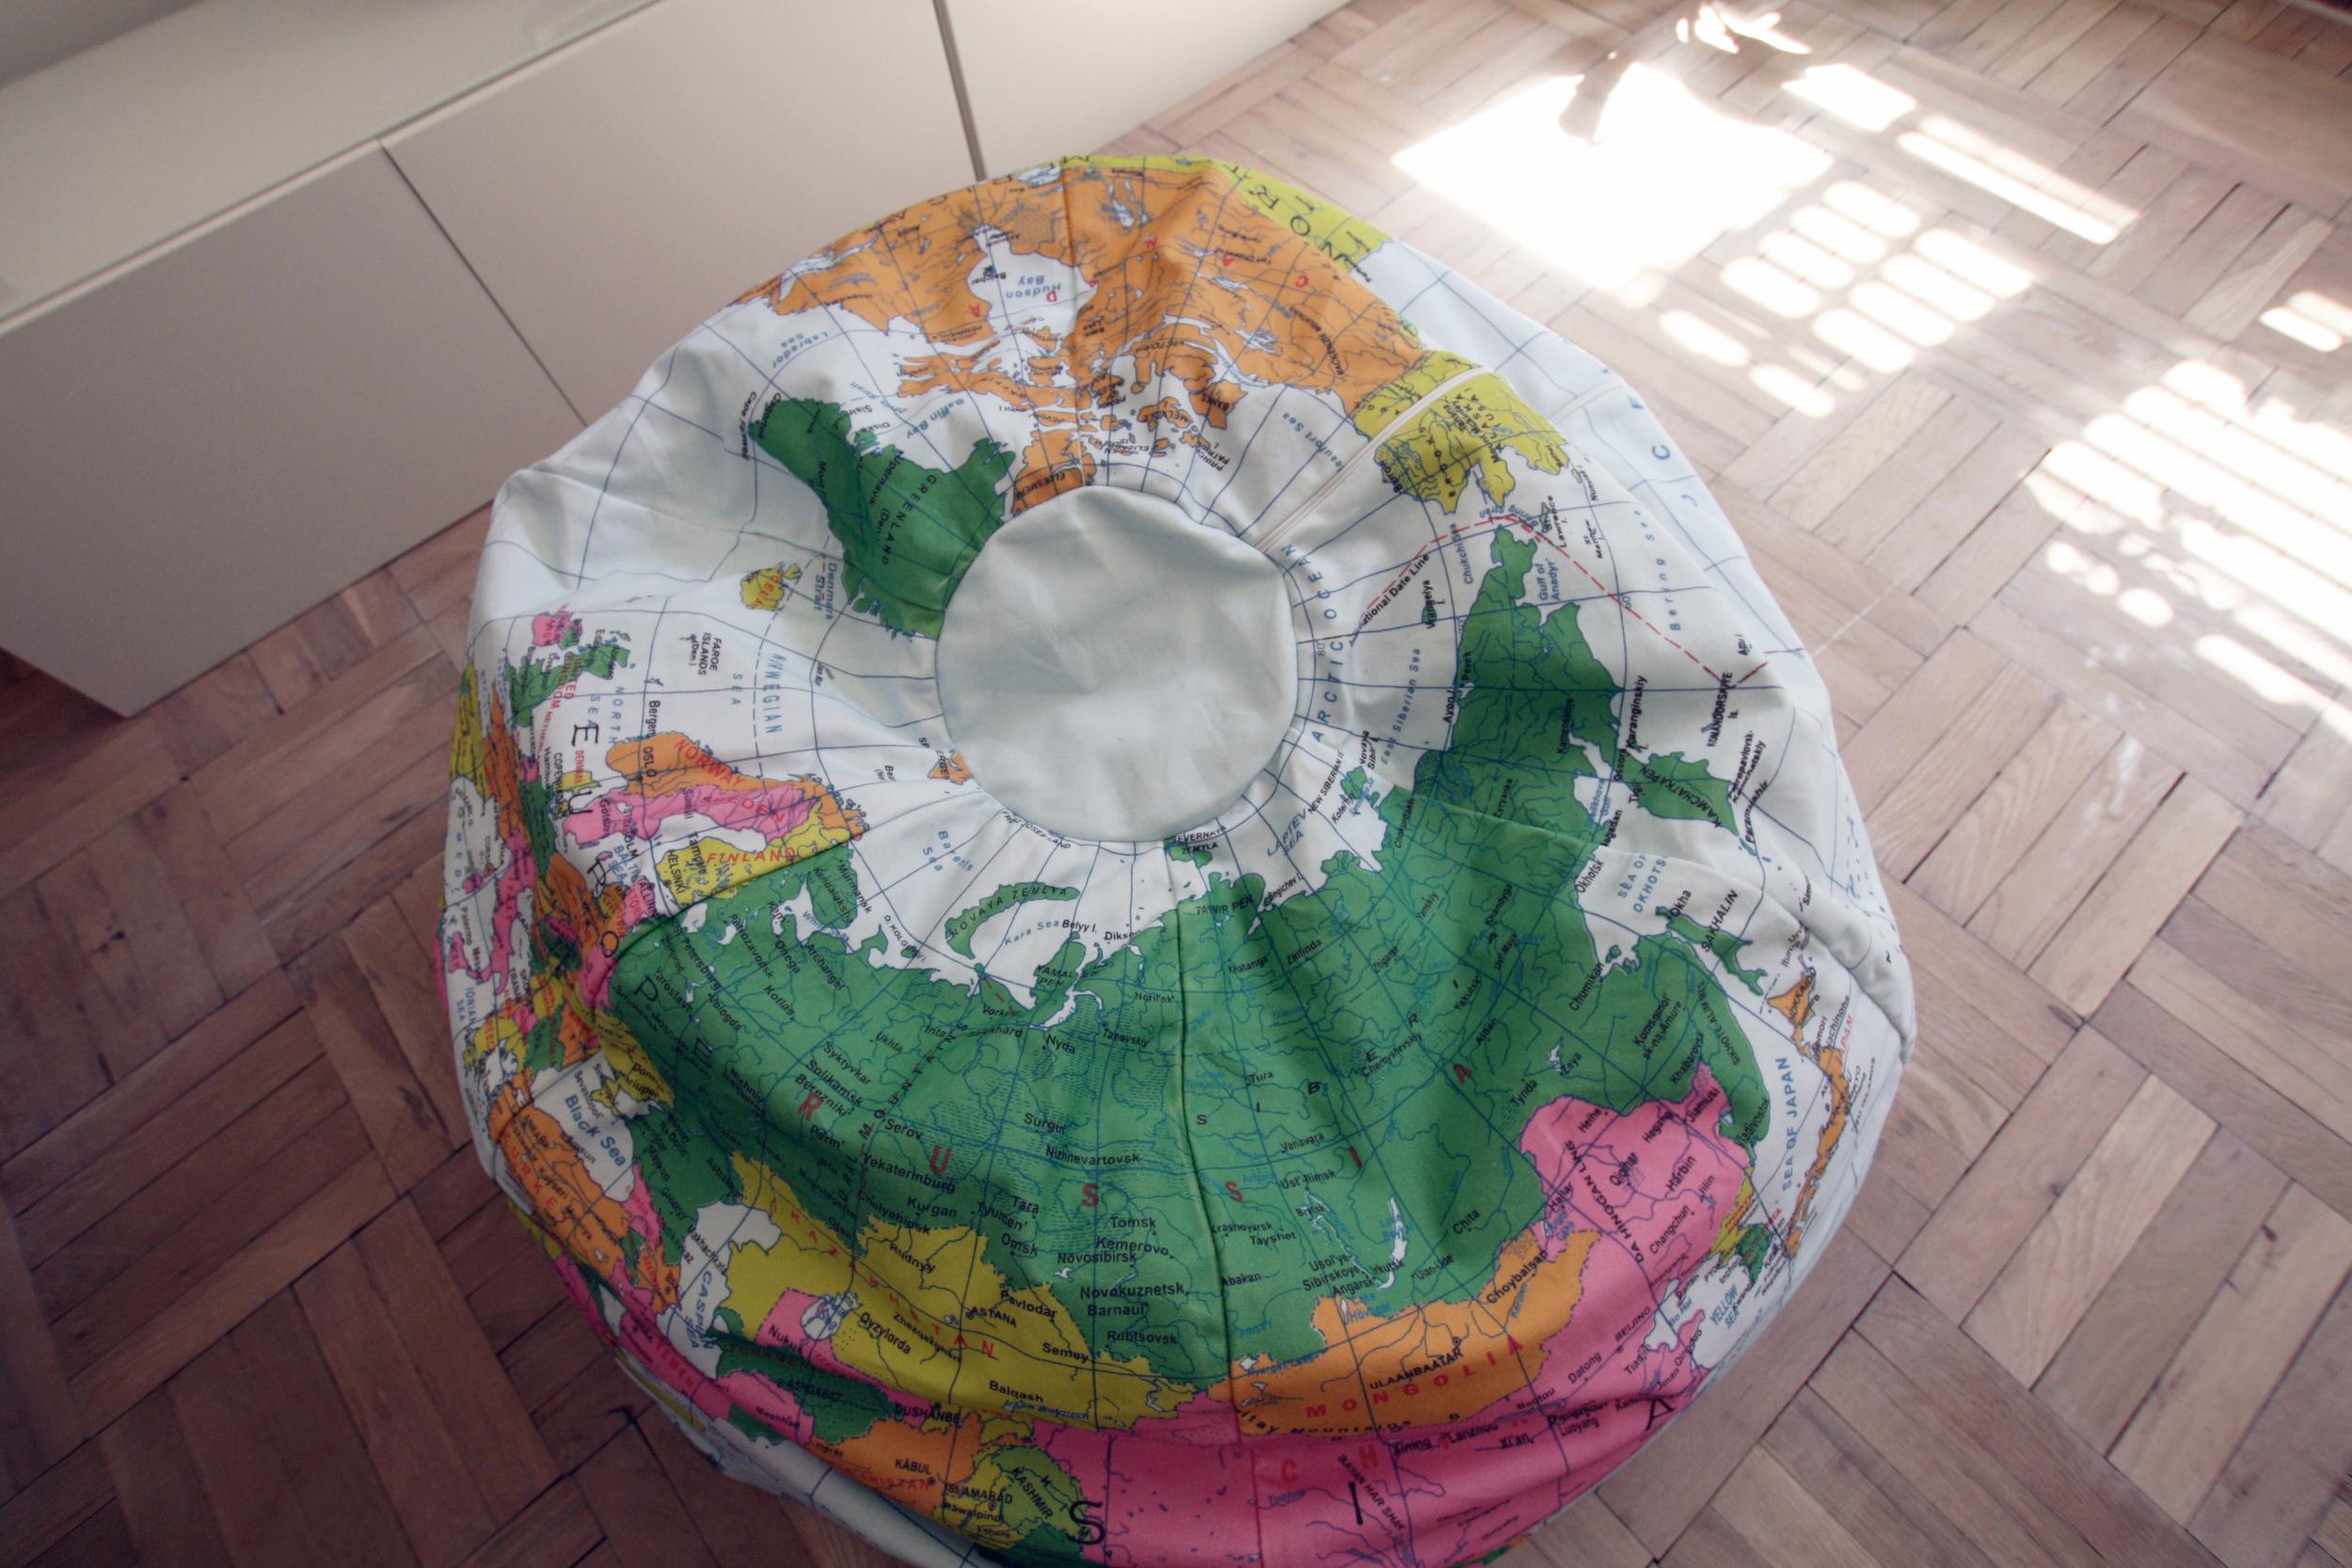 Amalgam Atlas World Map Chair.jpg